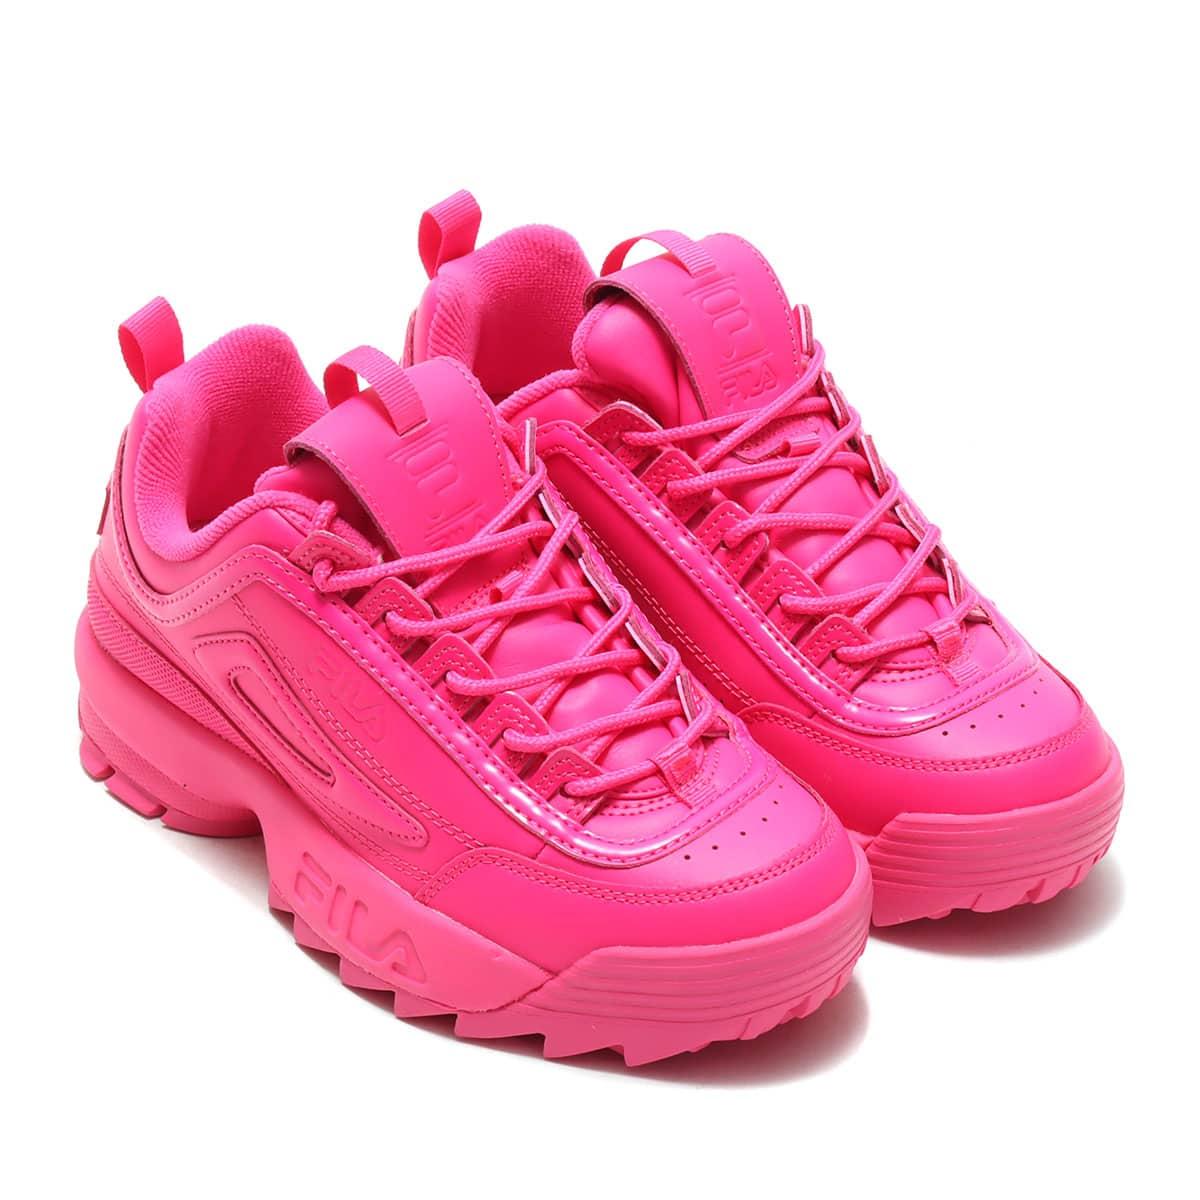 FILA Disruptor II Premium Pink Glo / Pink Glo / Pink Glo 21SS-S_photo_large